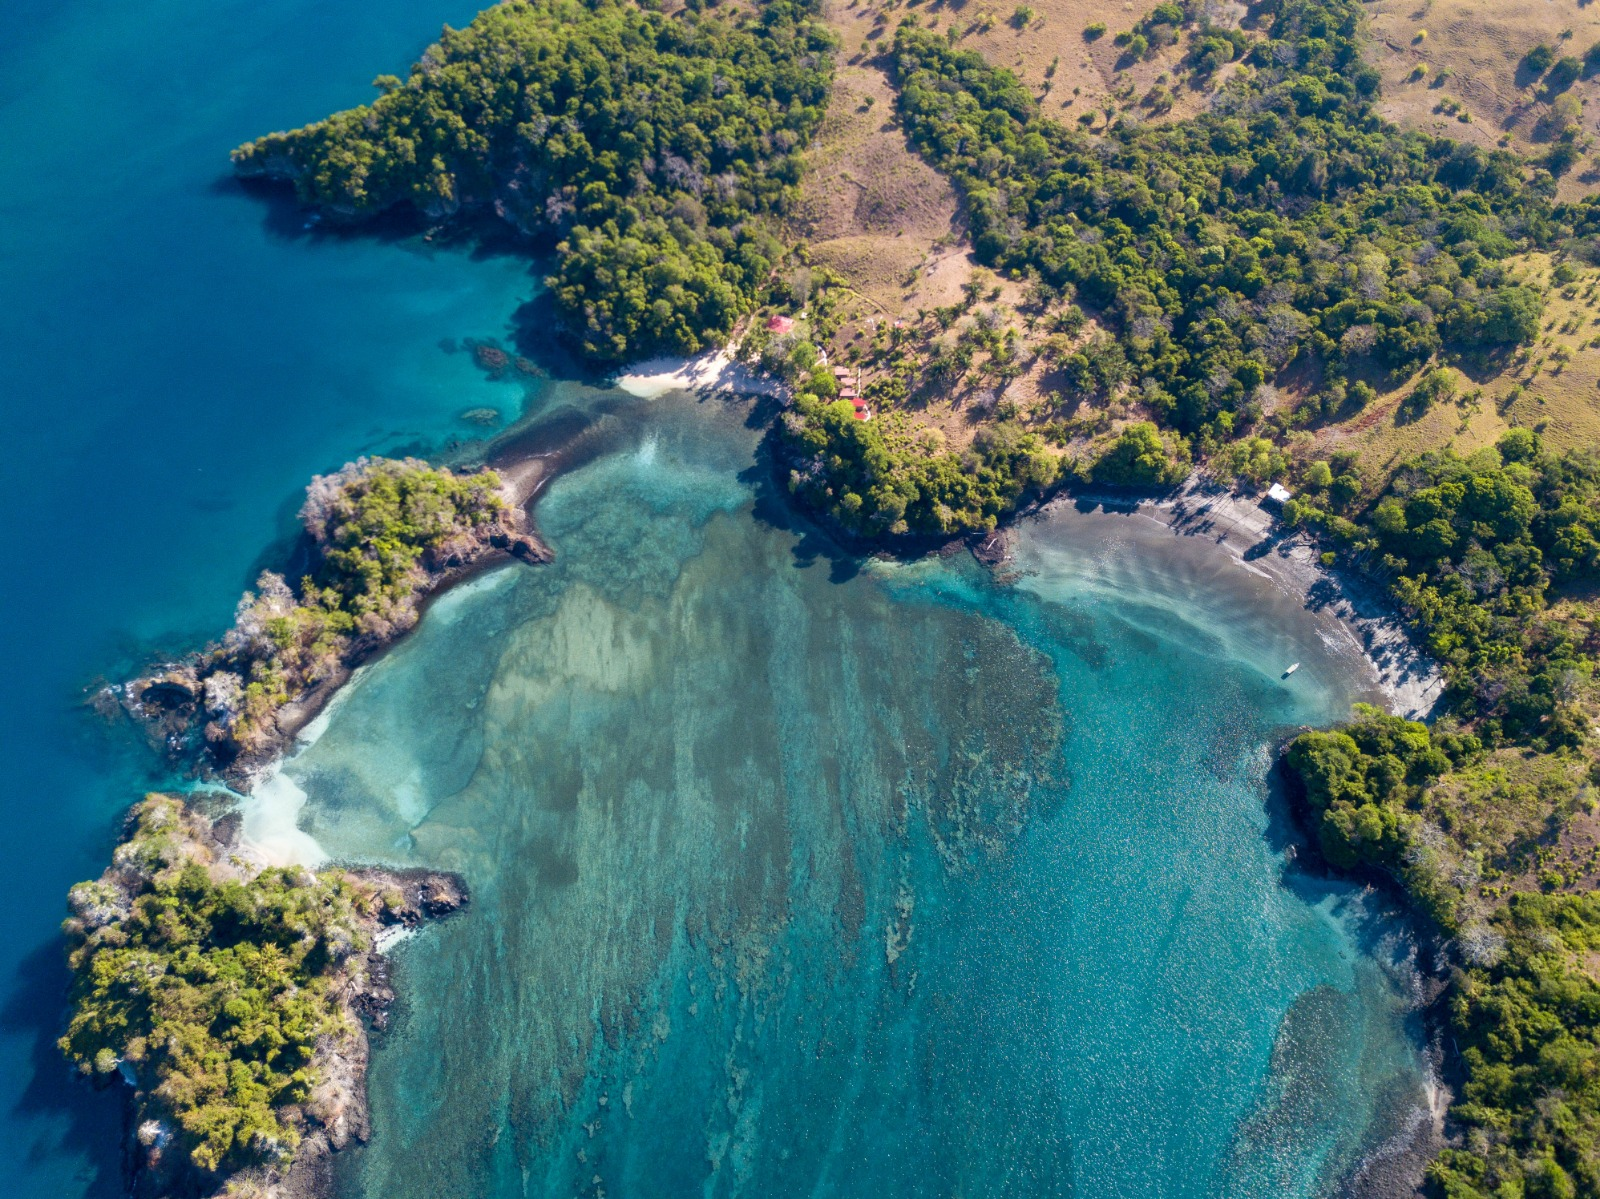 Punta Ballena aerial view